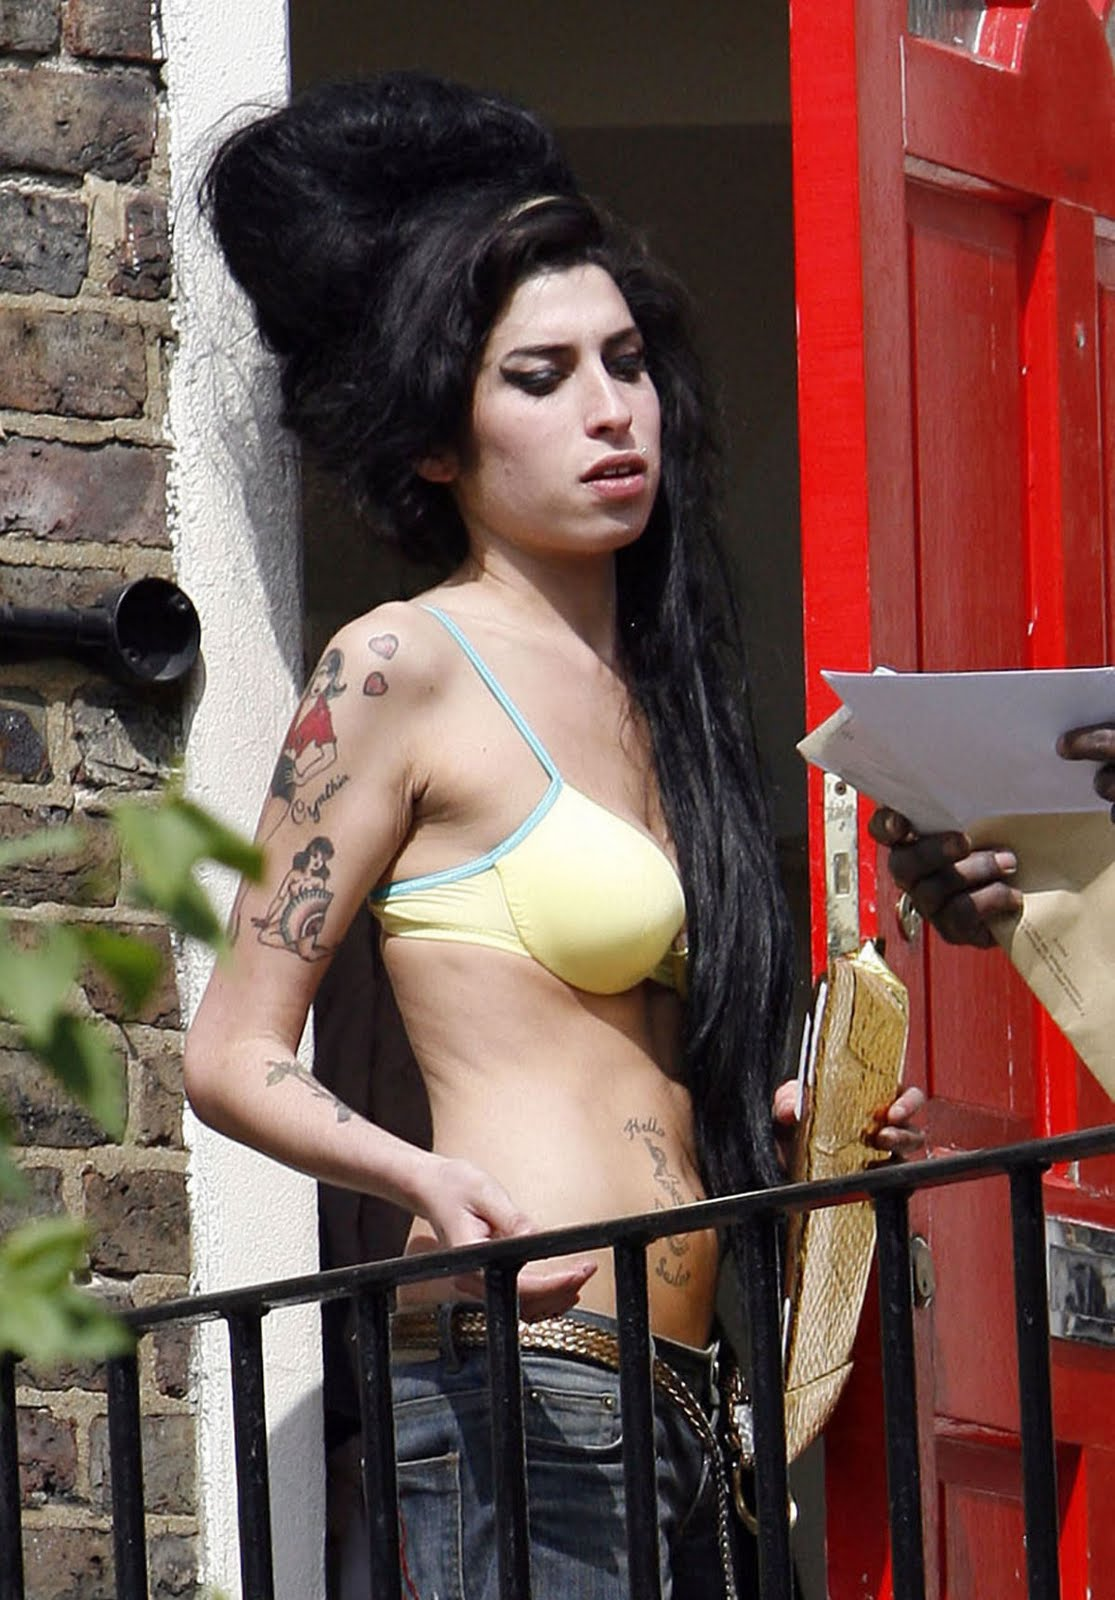 http://1.bp.blogspot.com/_csogD6ptEnI/SwD5iYORFGI/AAAAAAAADhk/l5eOHFCGSXI/s1600/Amy_Winehouse_06.jpg